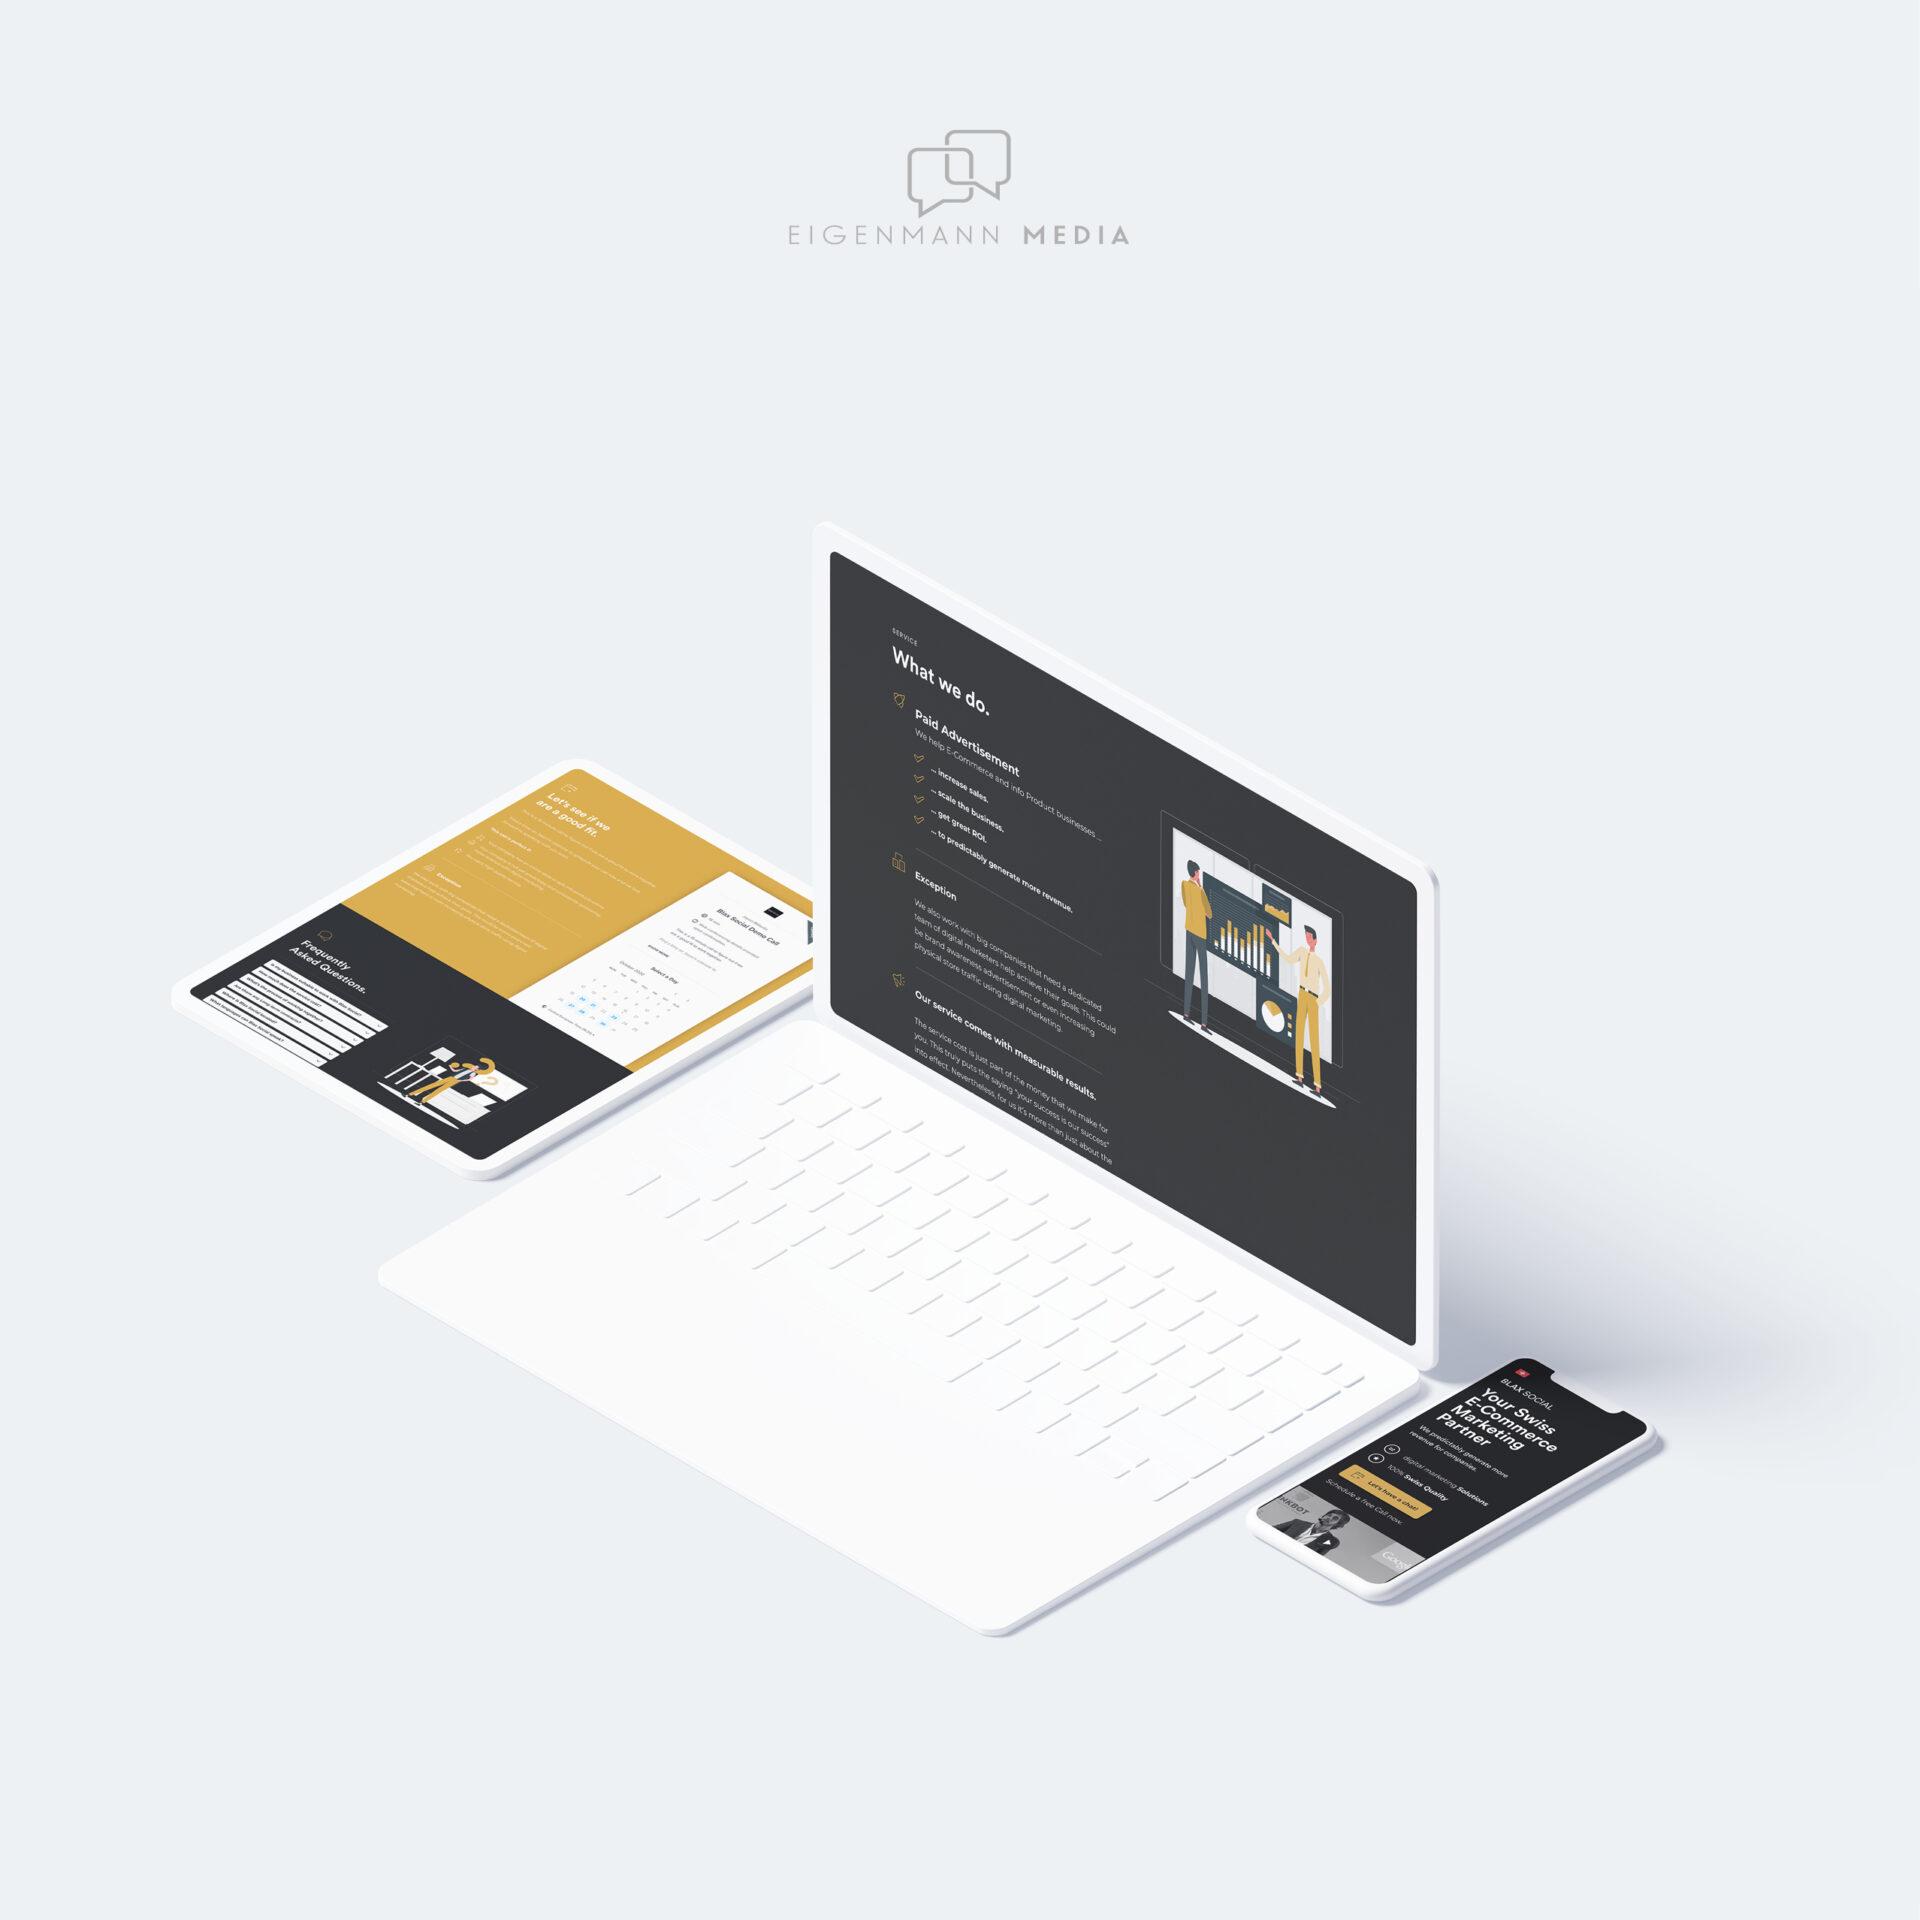 Blax Social Webseite Responsive Design